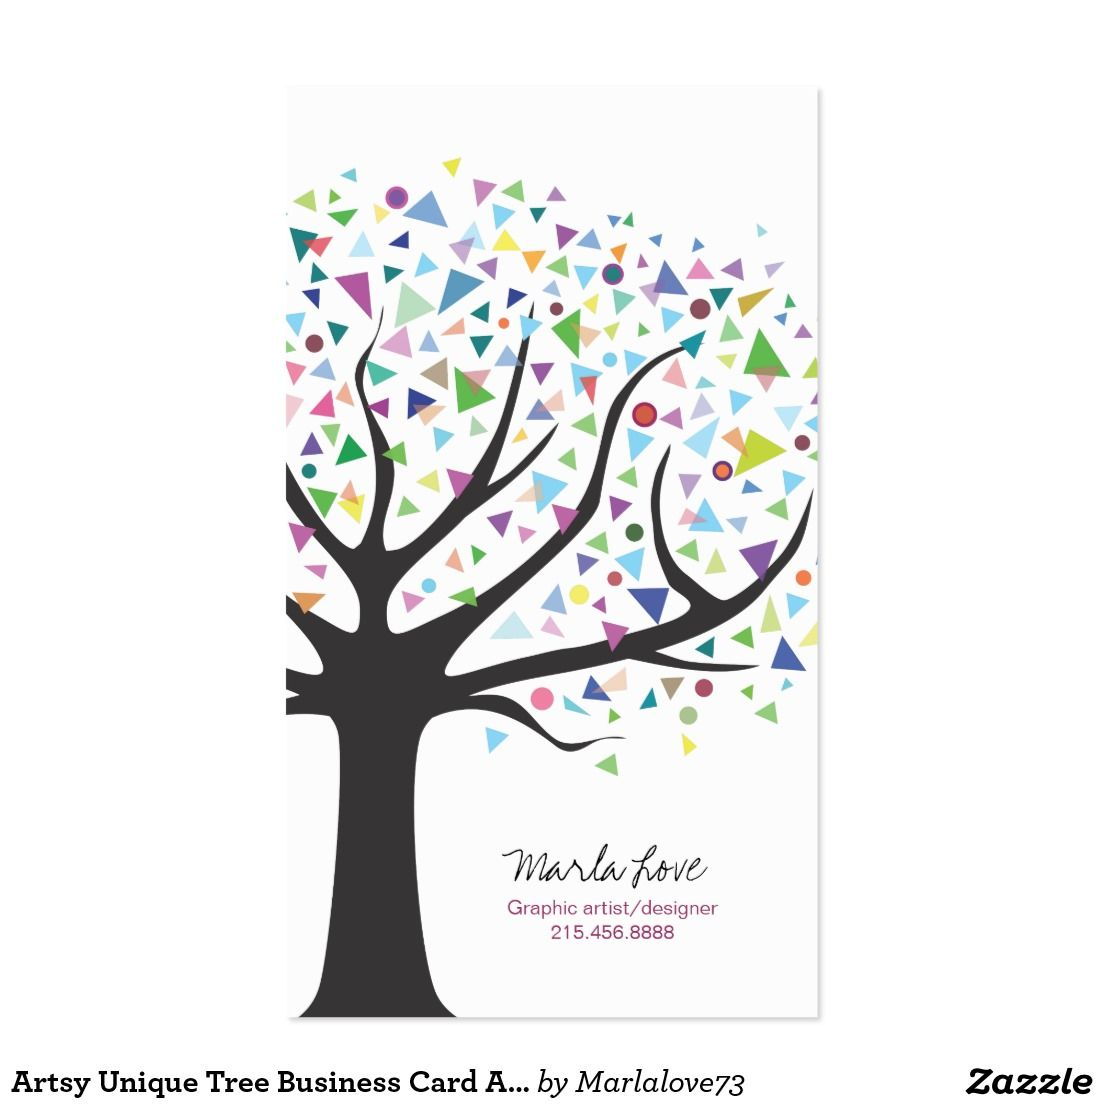 Artsy Unique Tree Business Card Art designer | Pinterest | Artsy